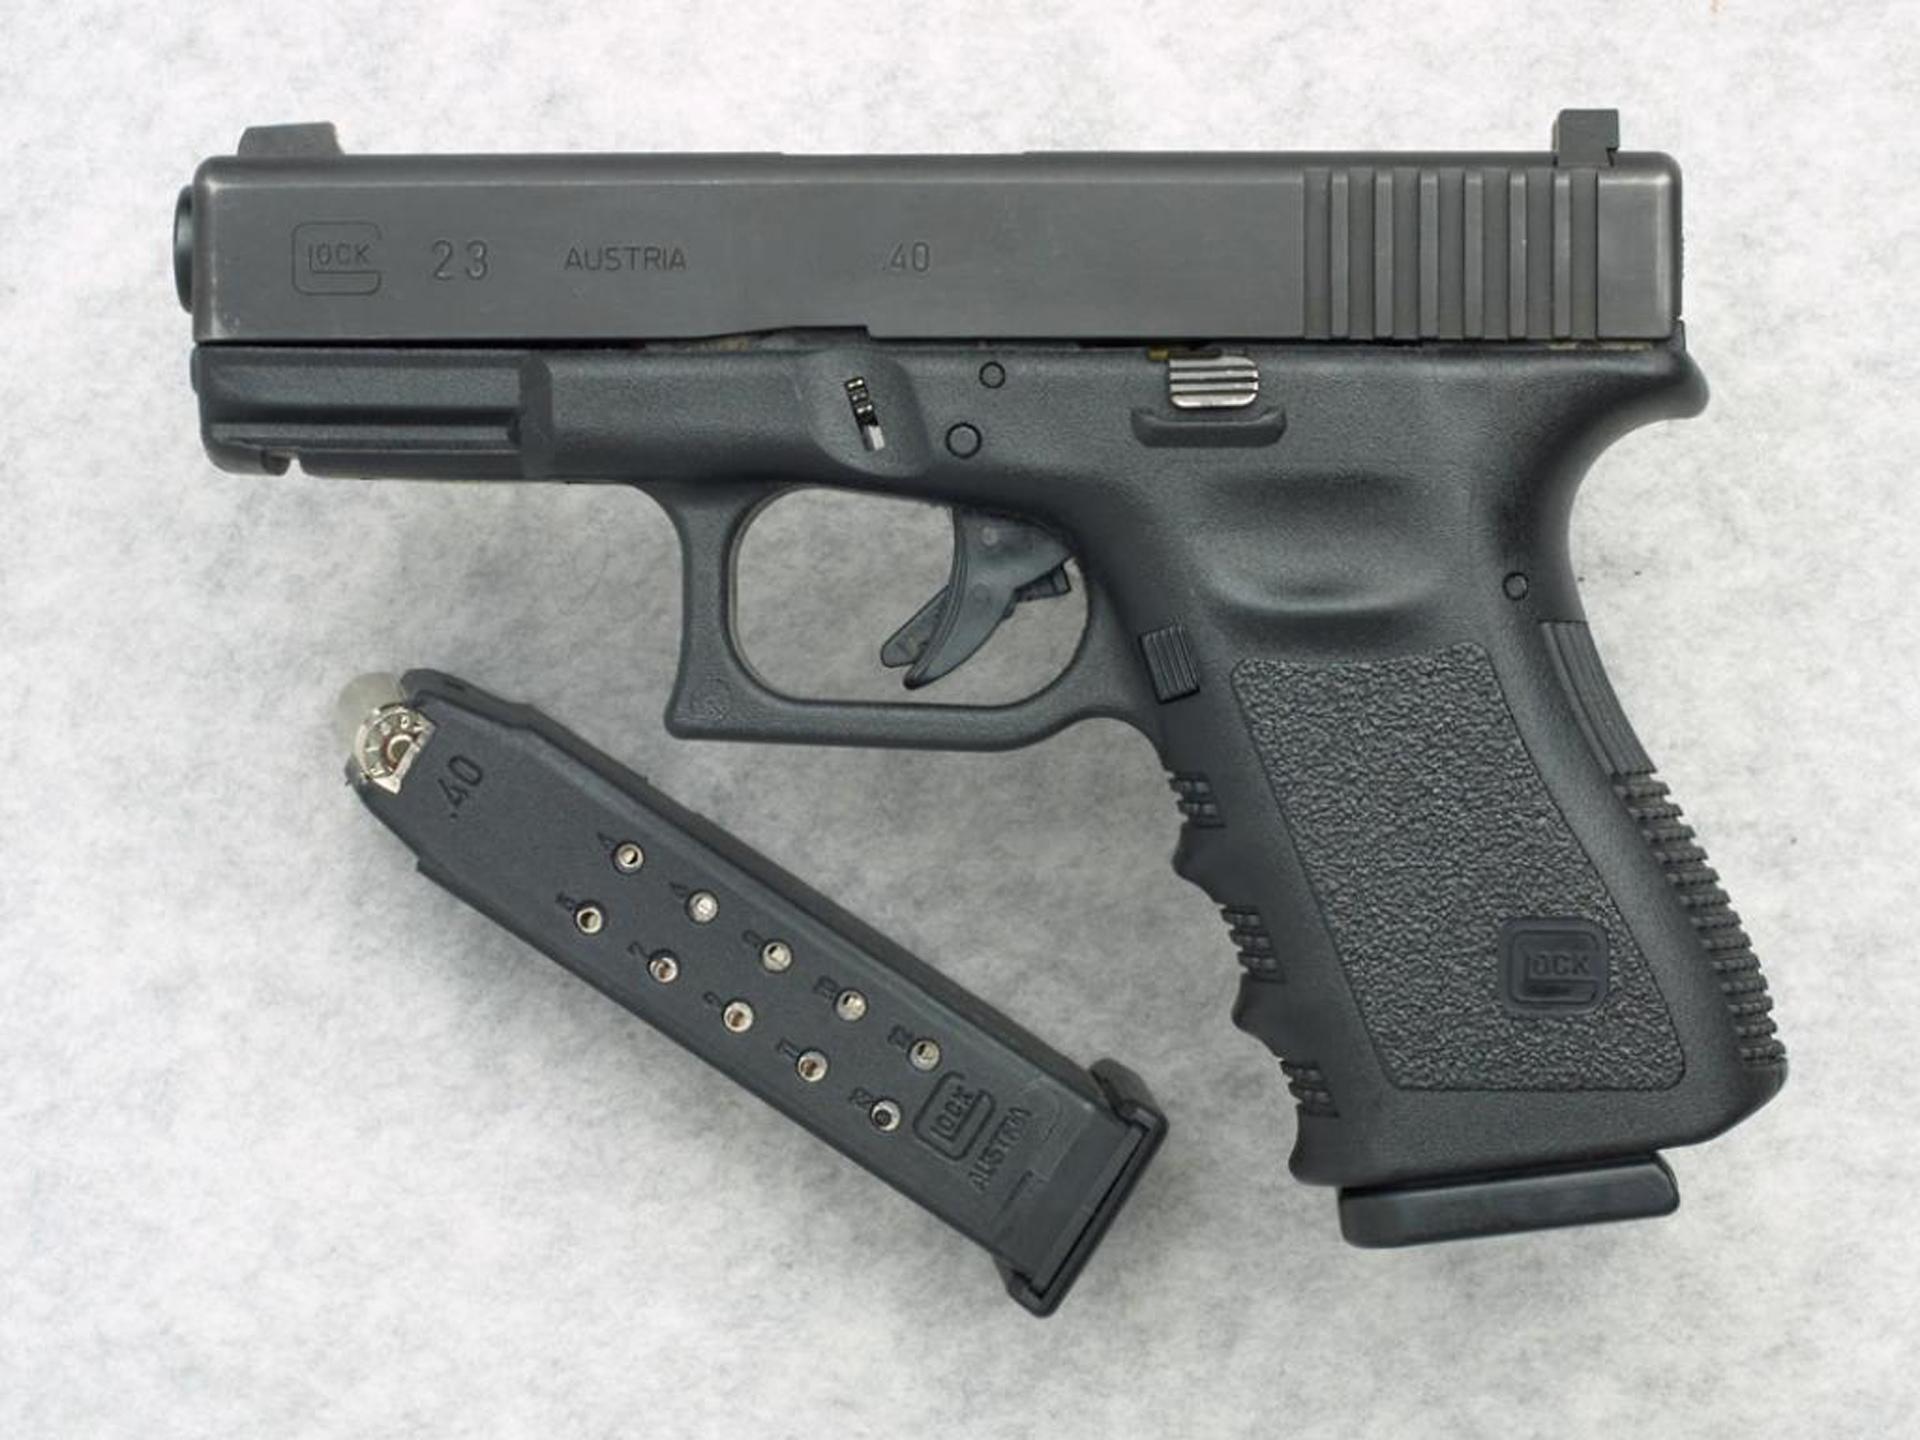 Glock Pistol wallpapers HD quality